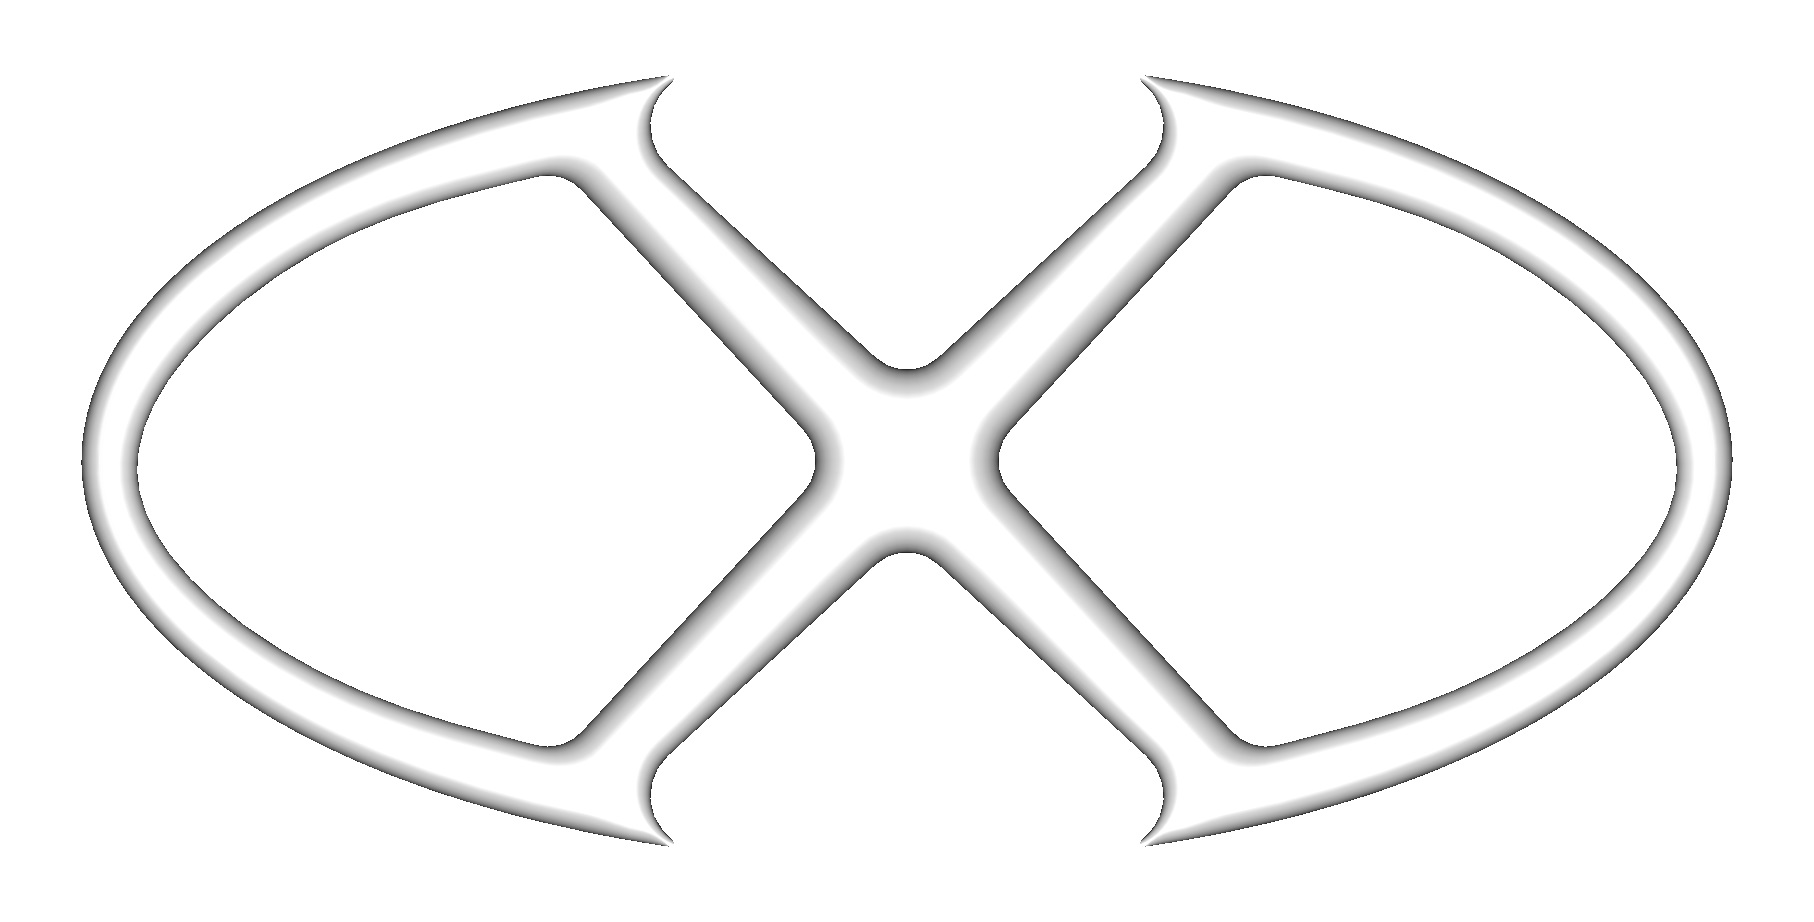 XJ Clutch Pedal